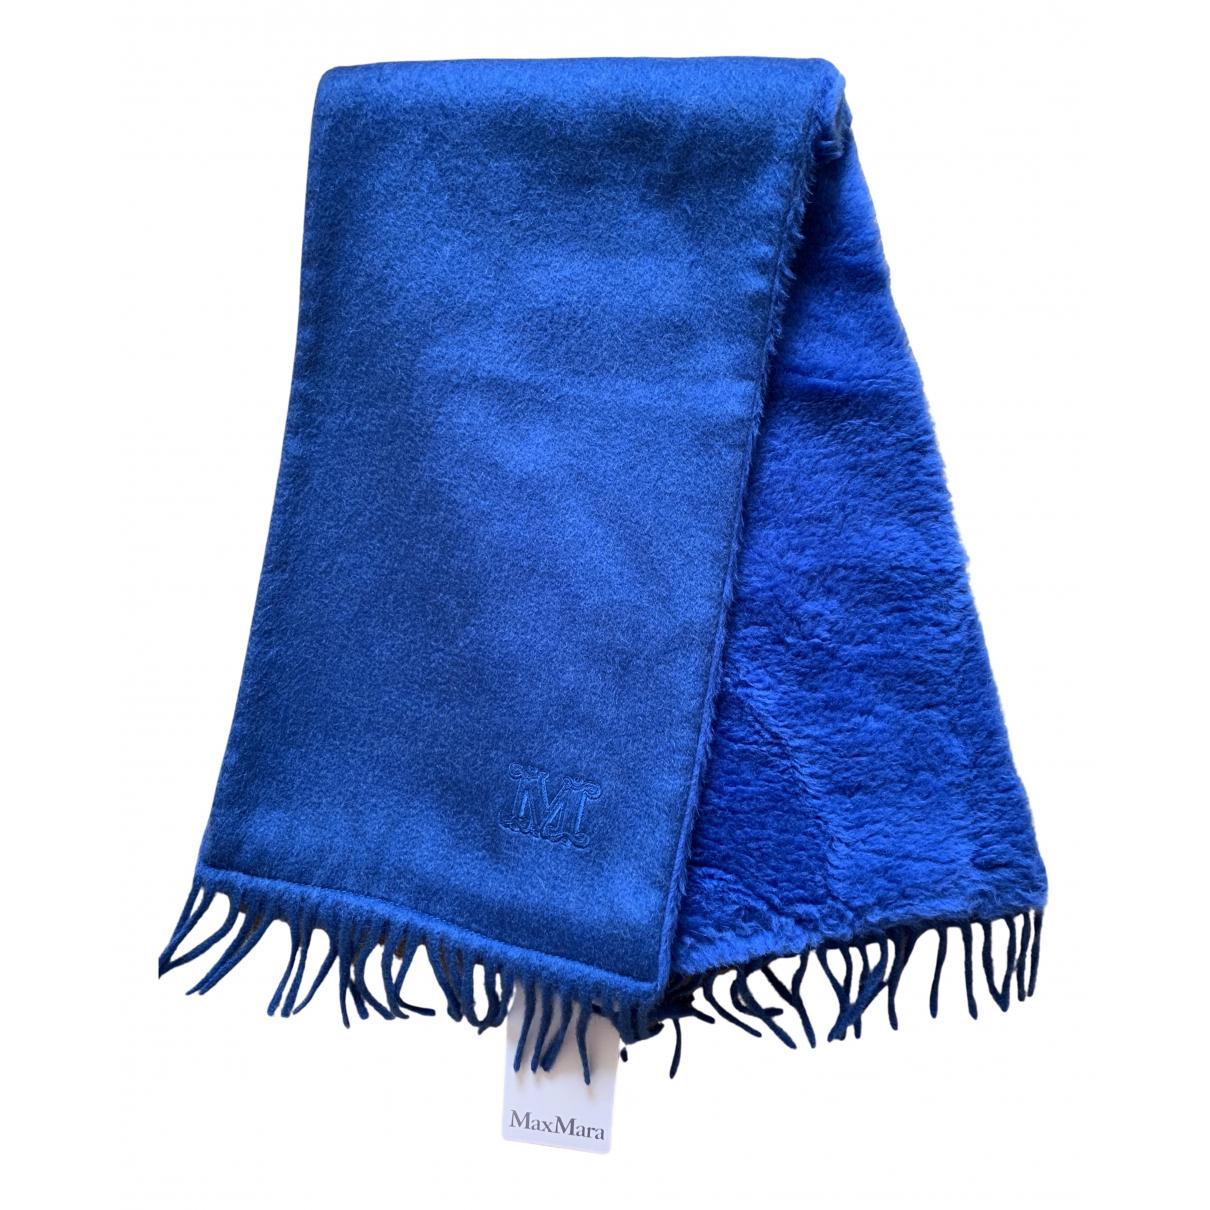 Max Mara - Foulard   pour femme en laine - bleu